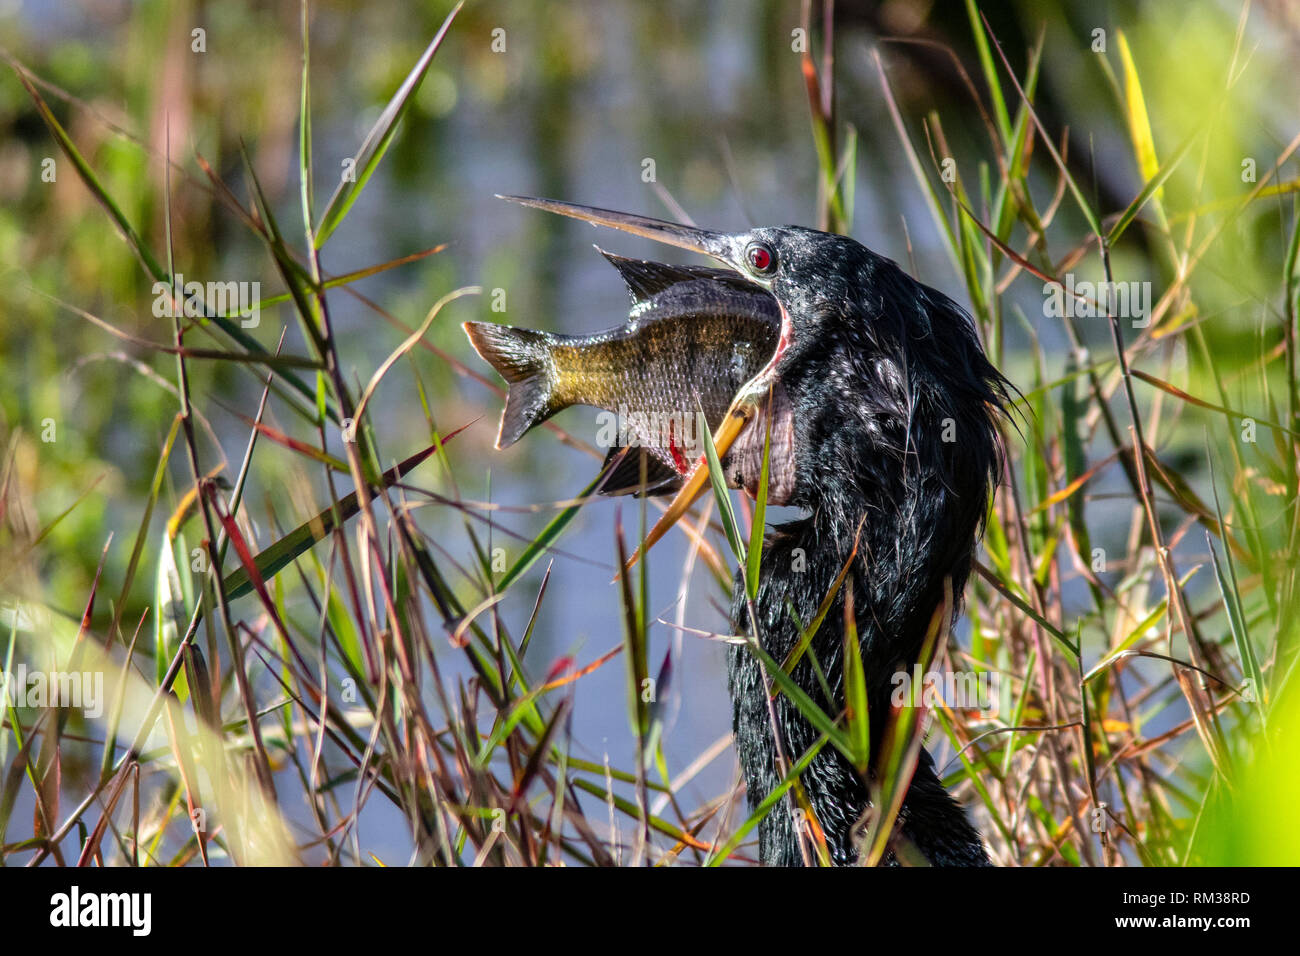 Anhinga trying to swallow large fish - Green Cay Wetlands - Boynton Beach, Florida, USA - Stock Image